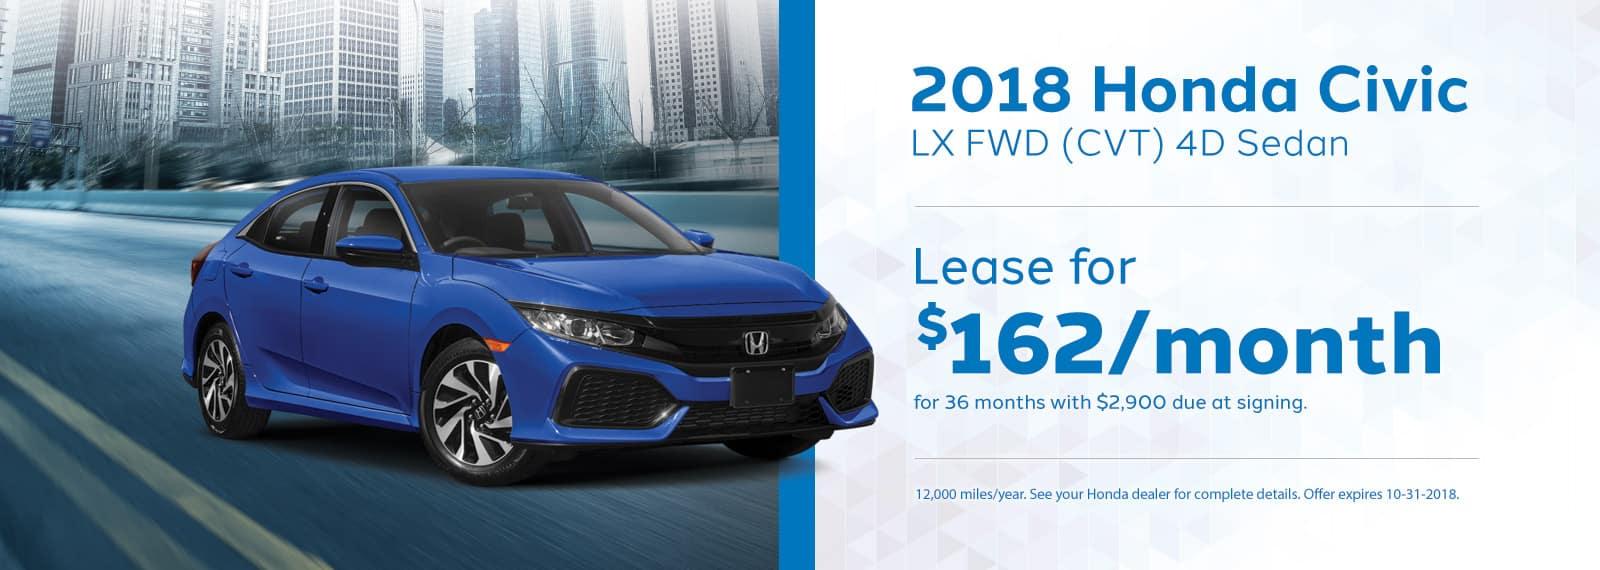 Civic LX Genthe Honda Lease Offer September 2018 Homepage